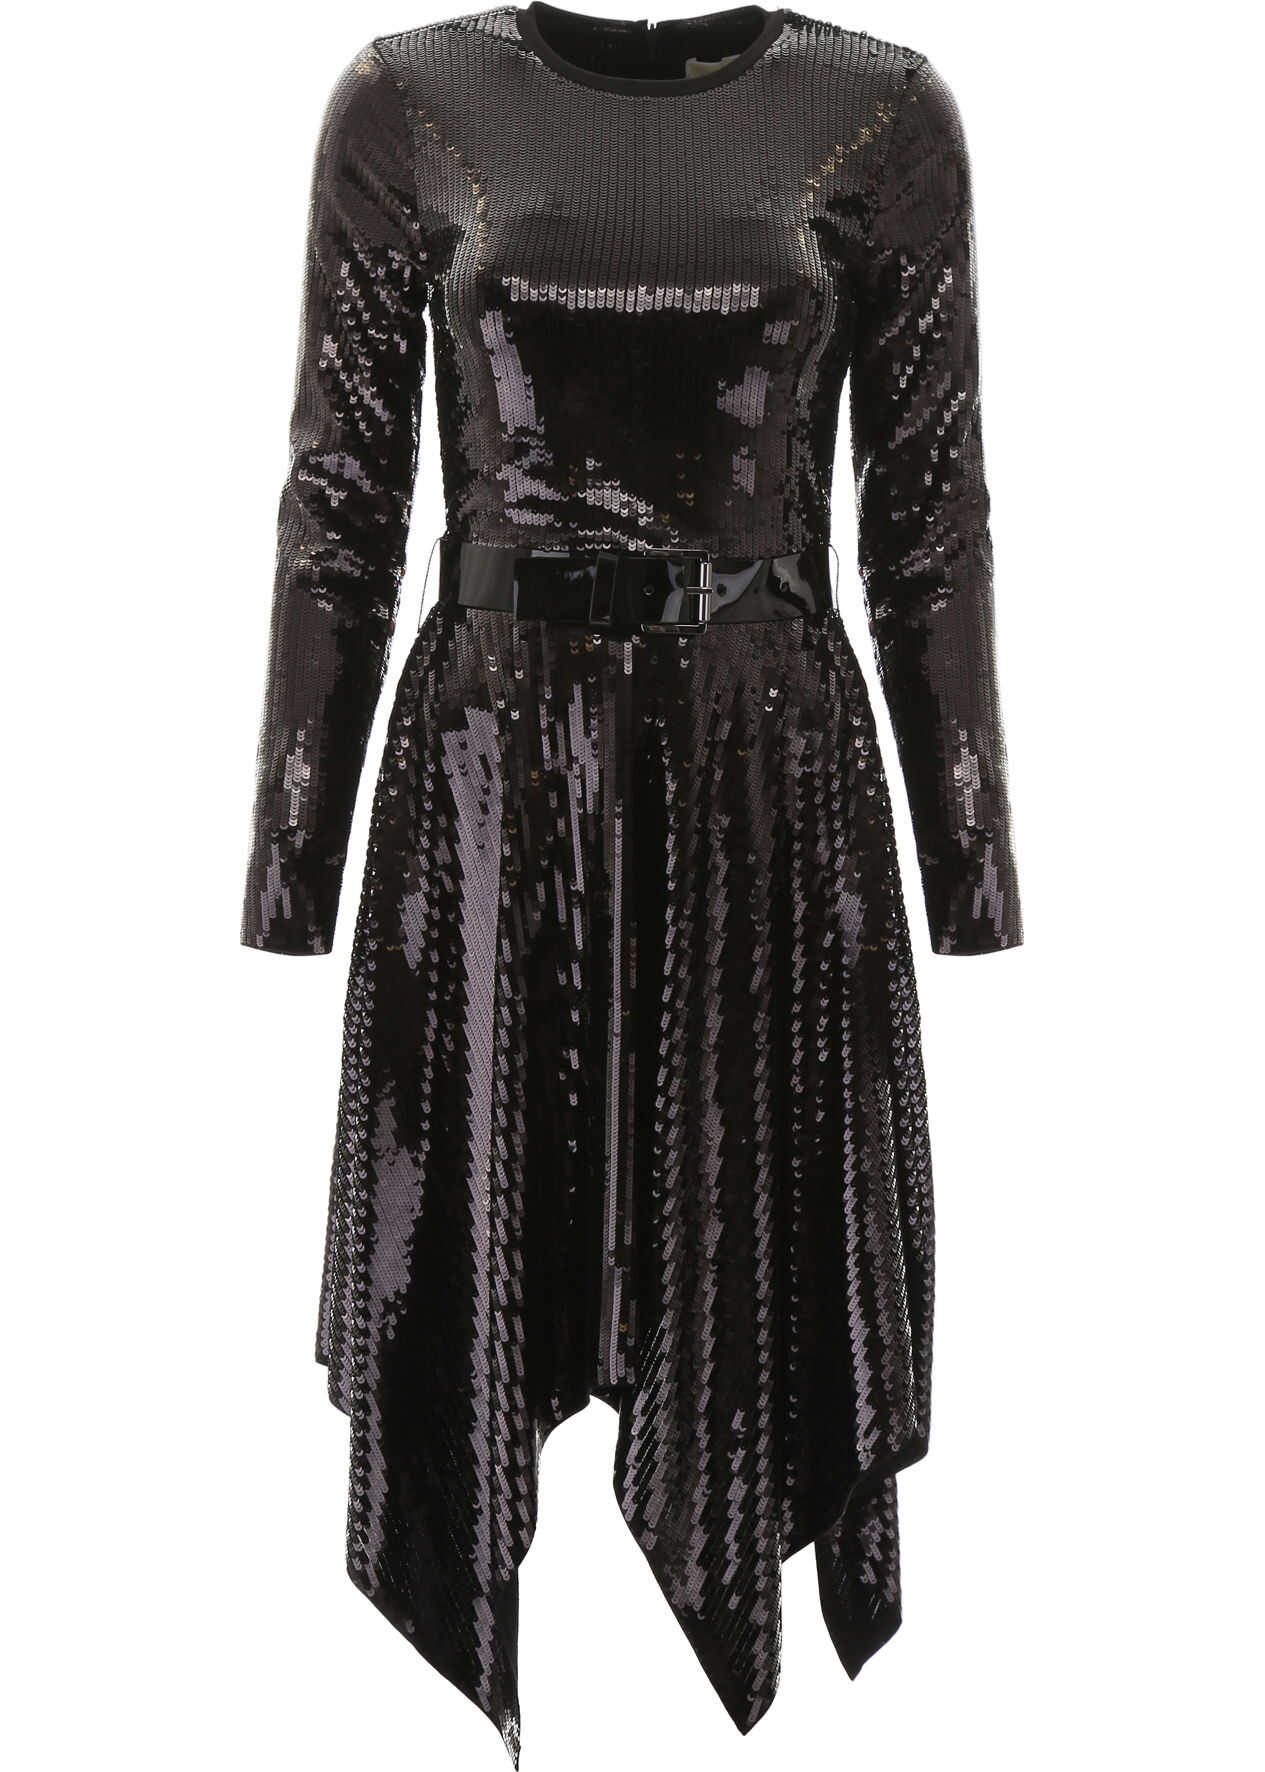 Michael Kors Sequined Dress BLACK